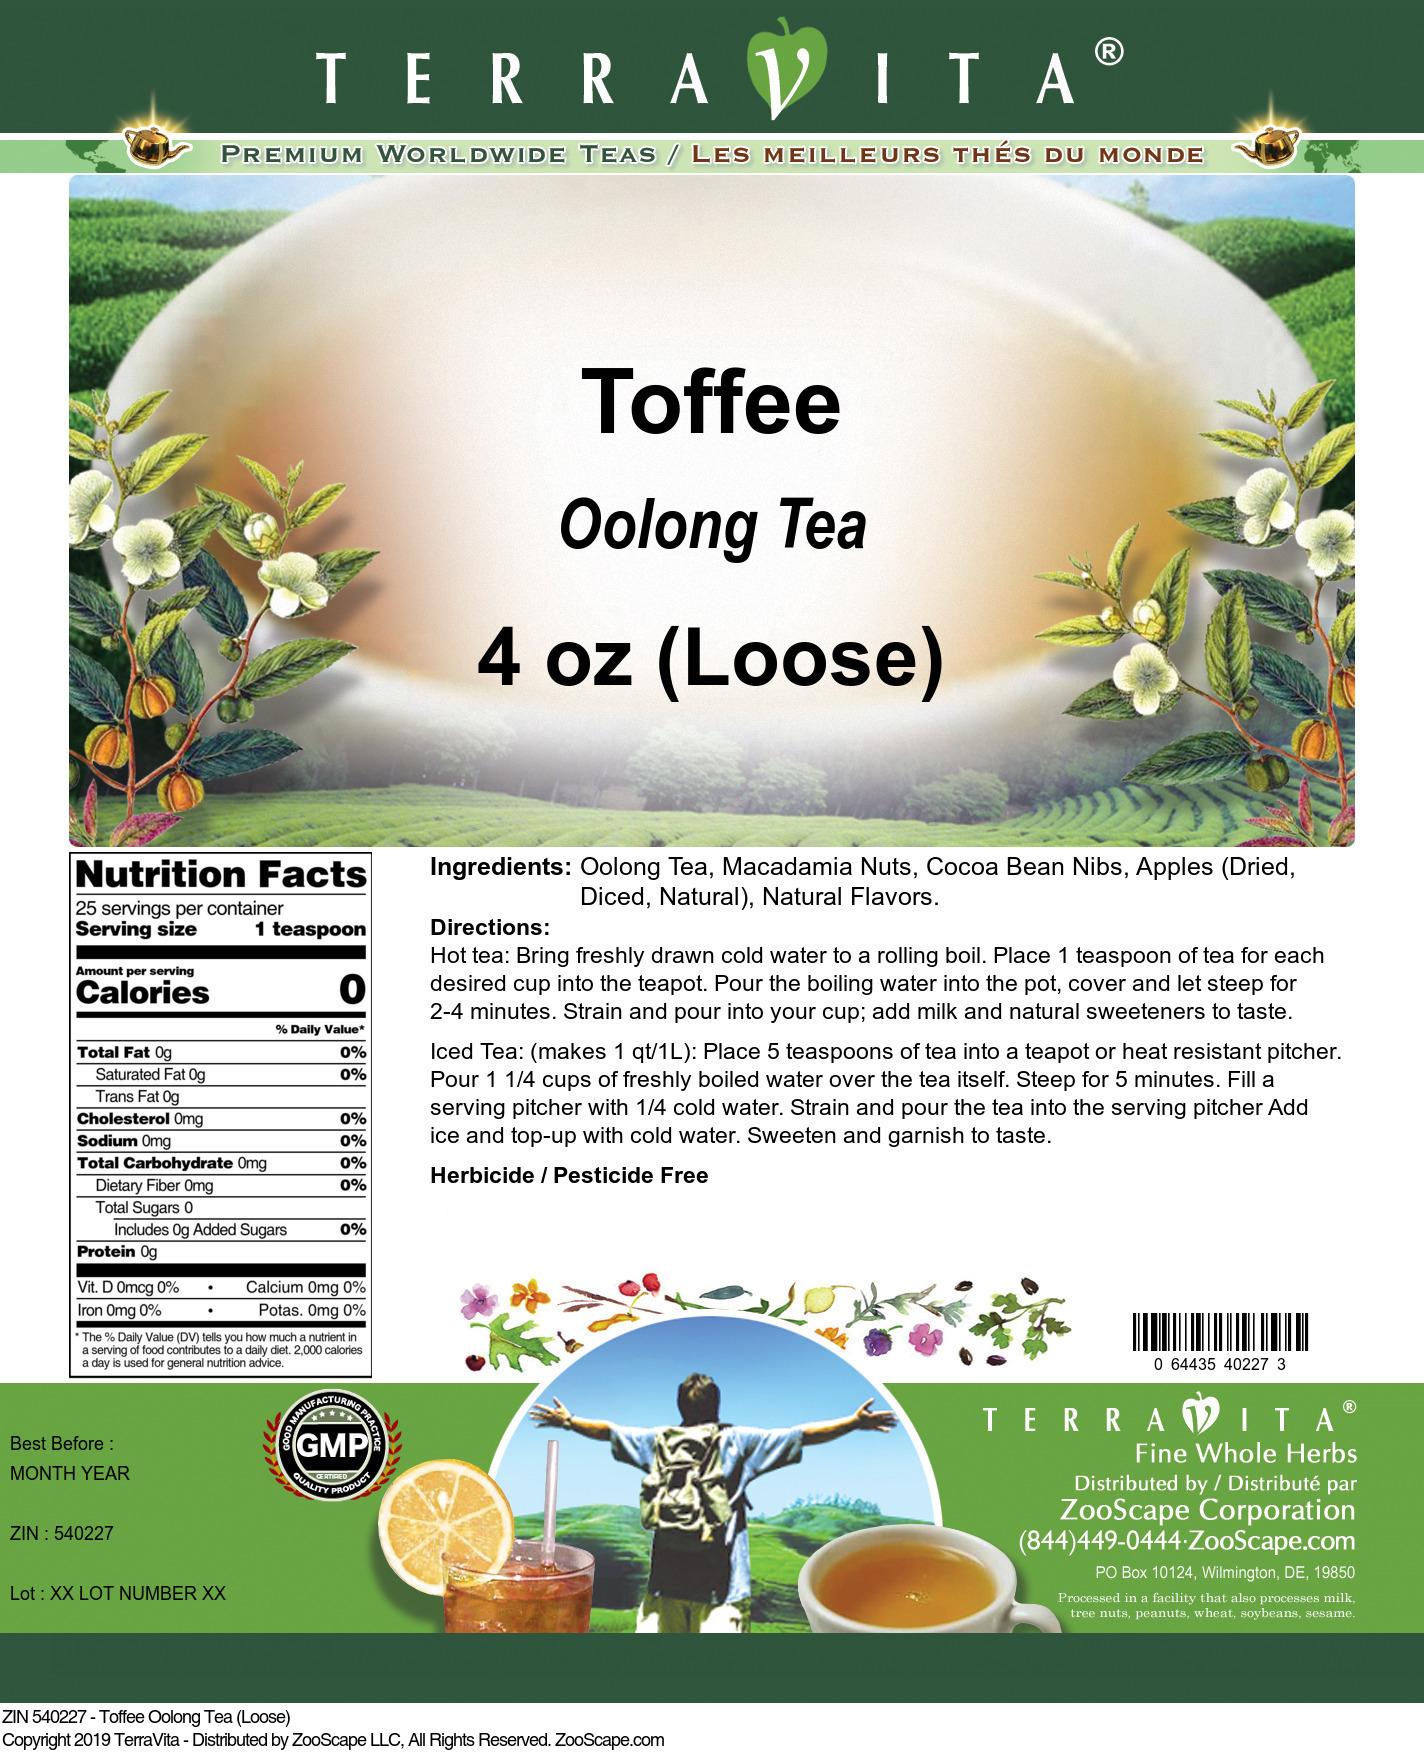 Toffee Oolong Tea (Loose)